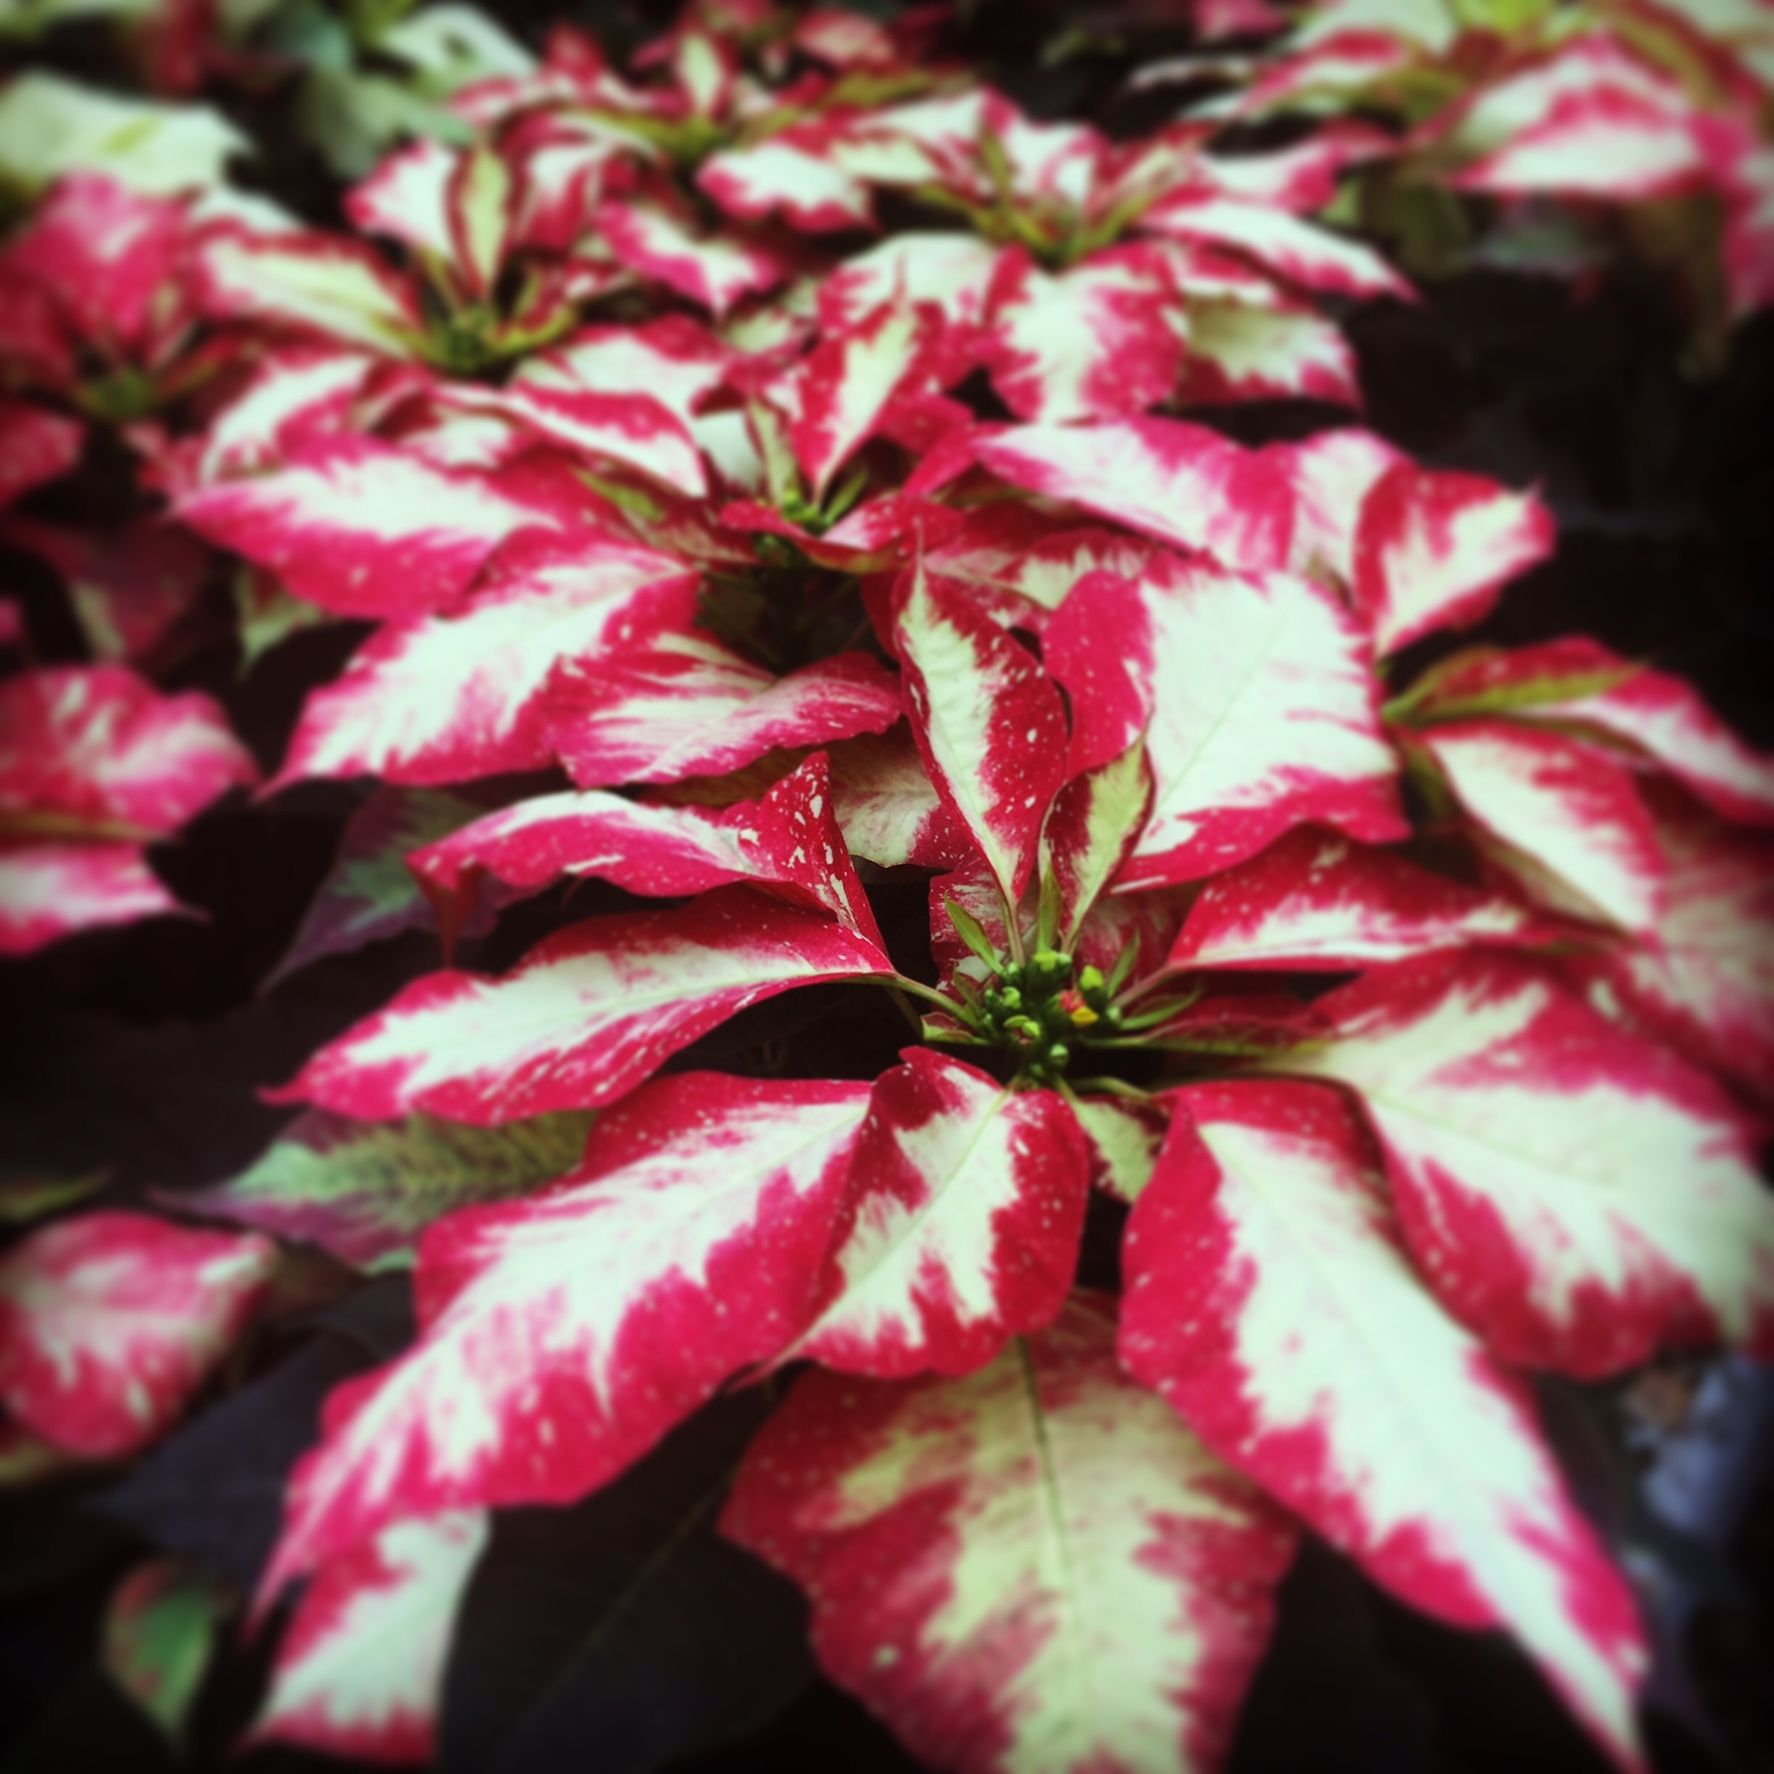 Jingle Bell Rock Poinsettia from Klepac Greenhouses